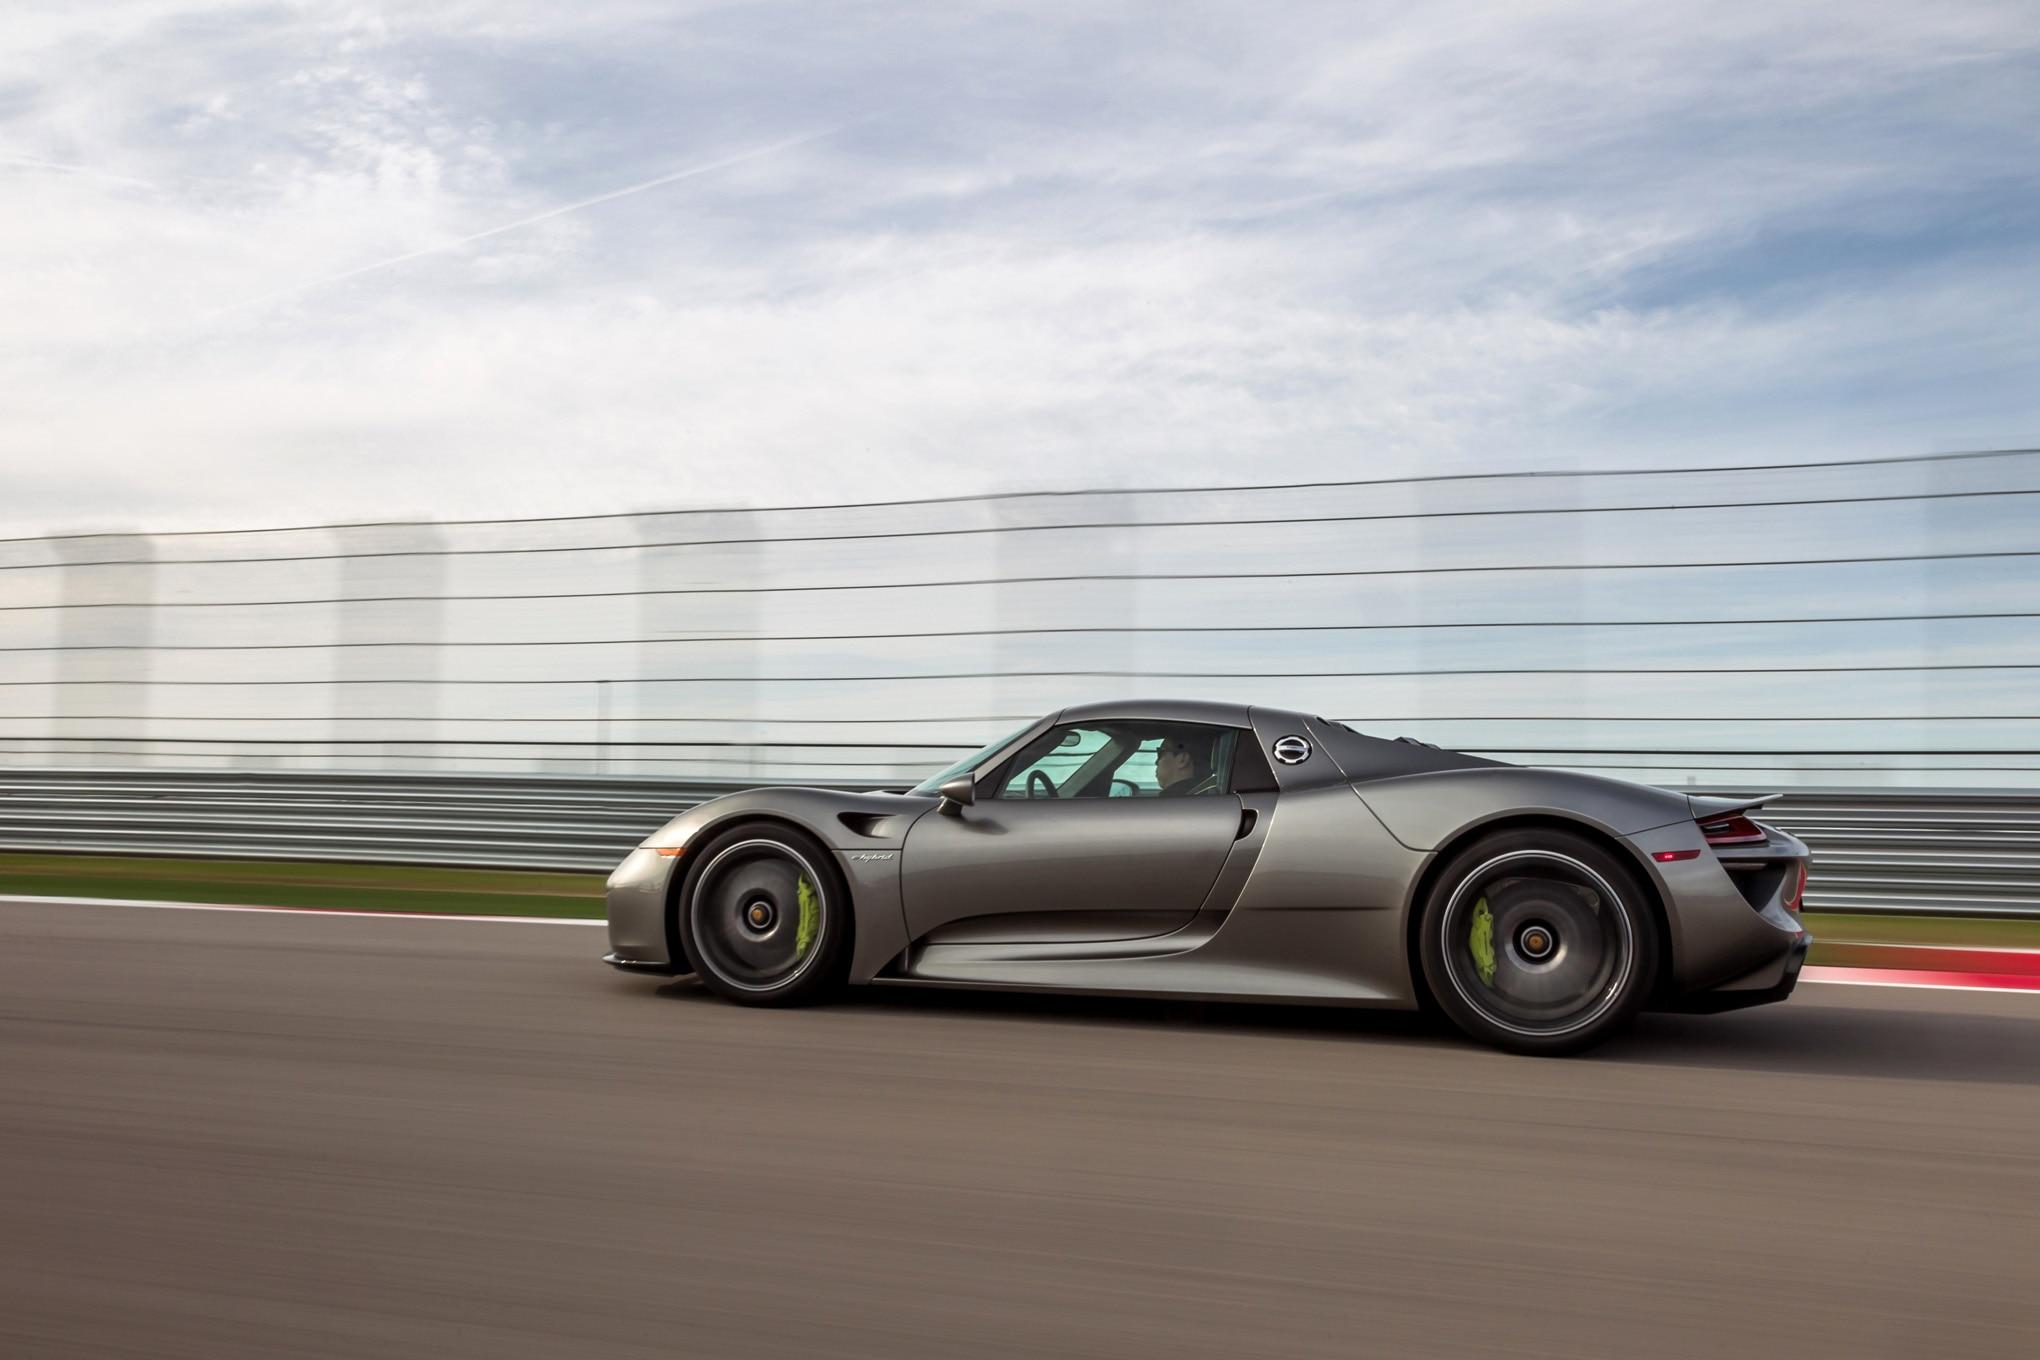 2015-Porsche-918-Spyder-side-profile-in-motion Gorgeous Porsche 918 Spyder High-performance Concept Cars Trend